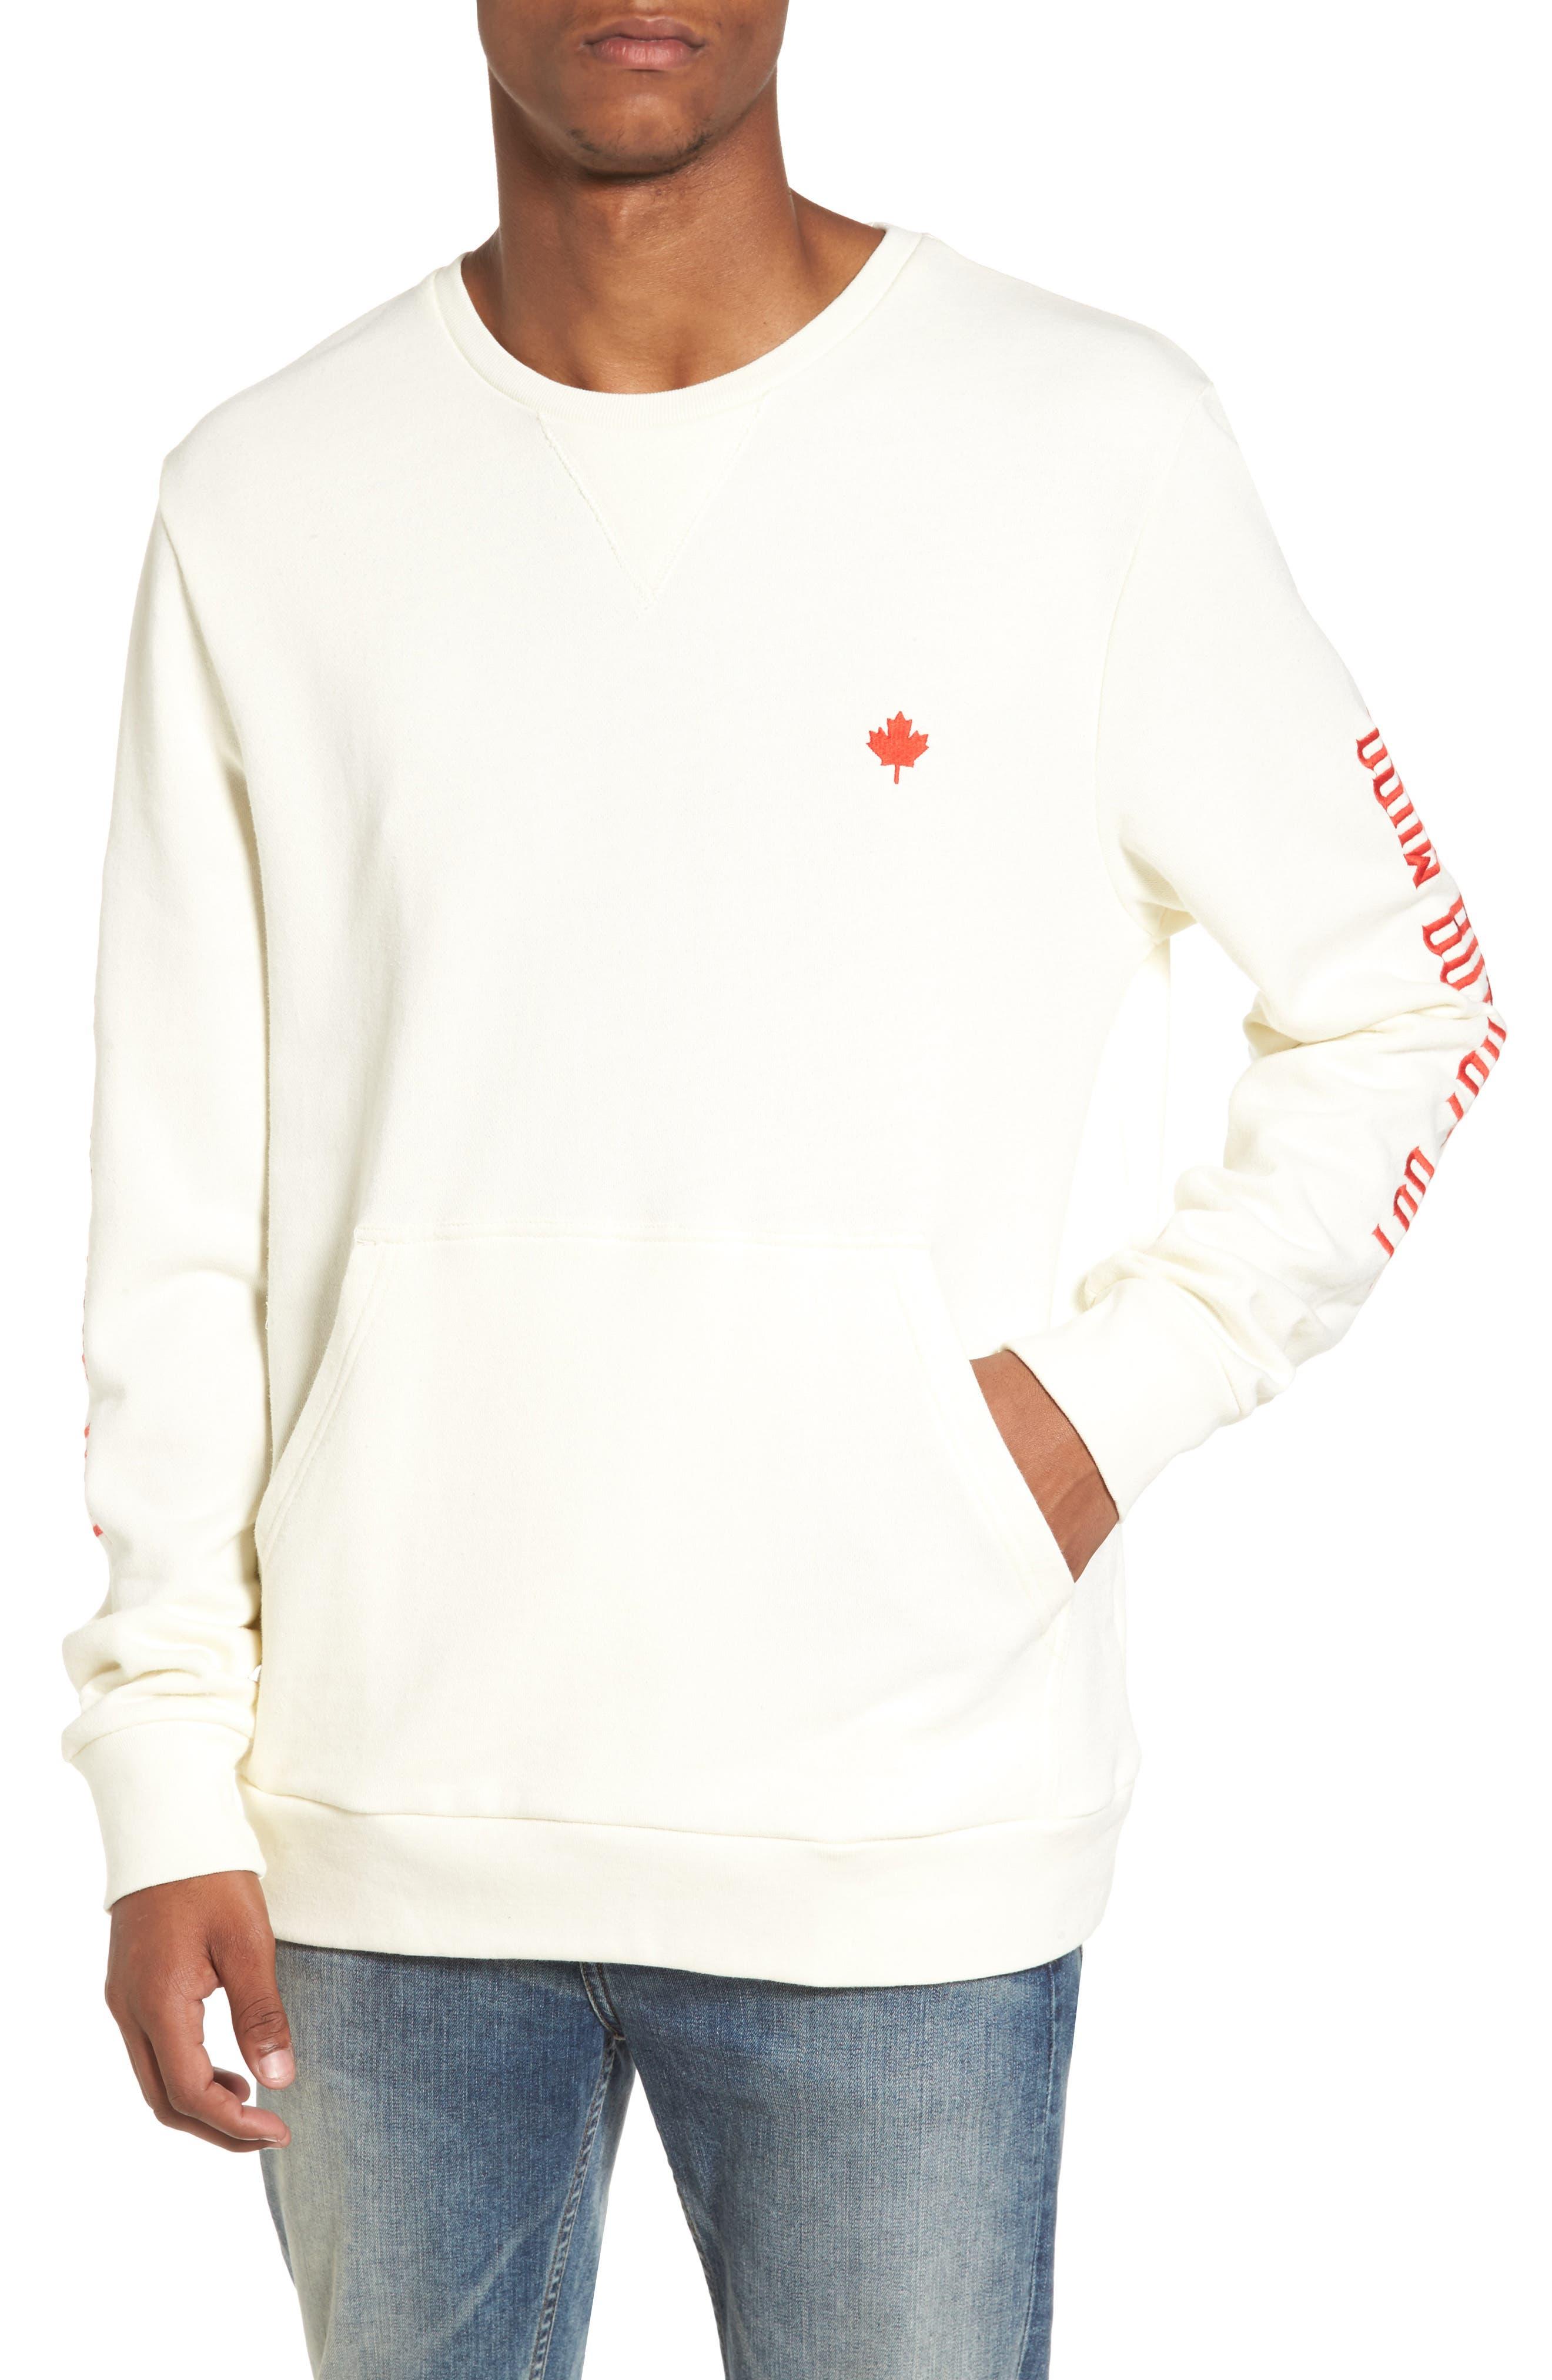 Up North Fleece Sweatshirt,                             Main thumbnail 2, color,